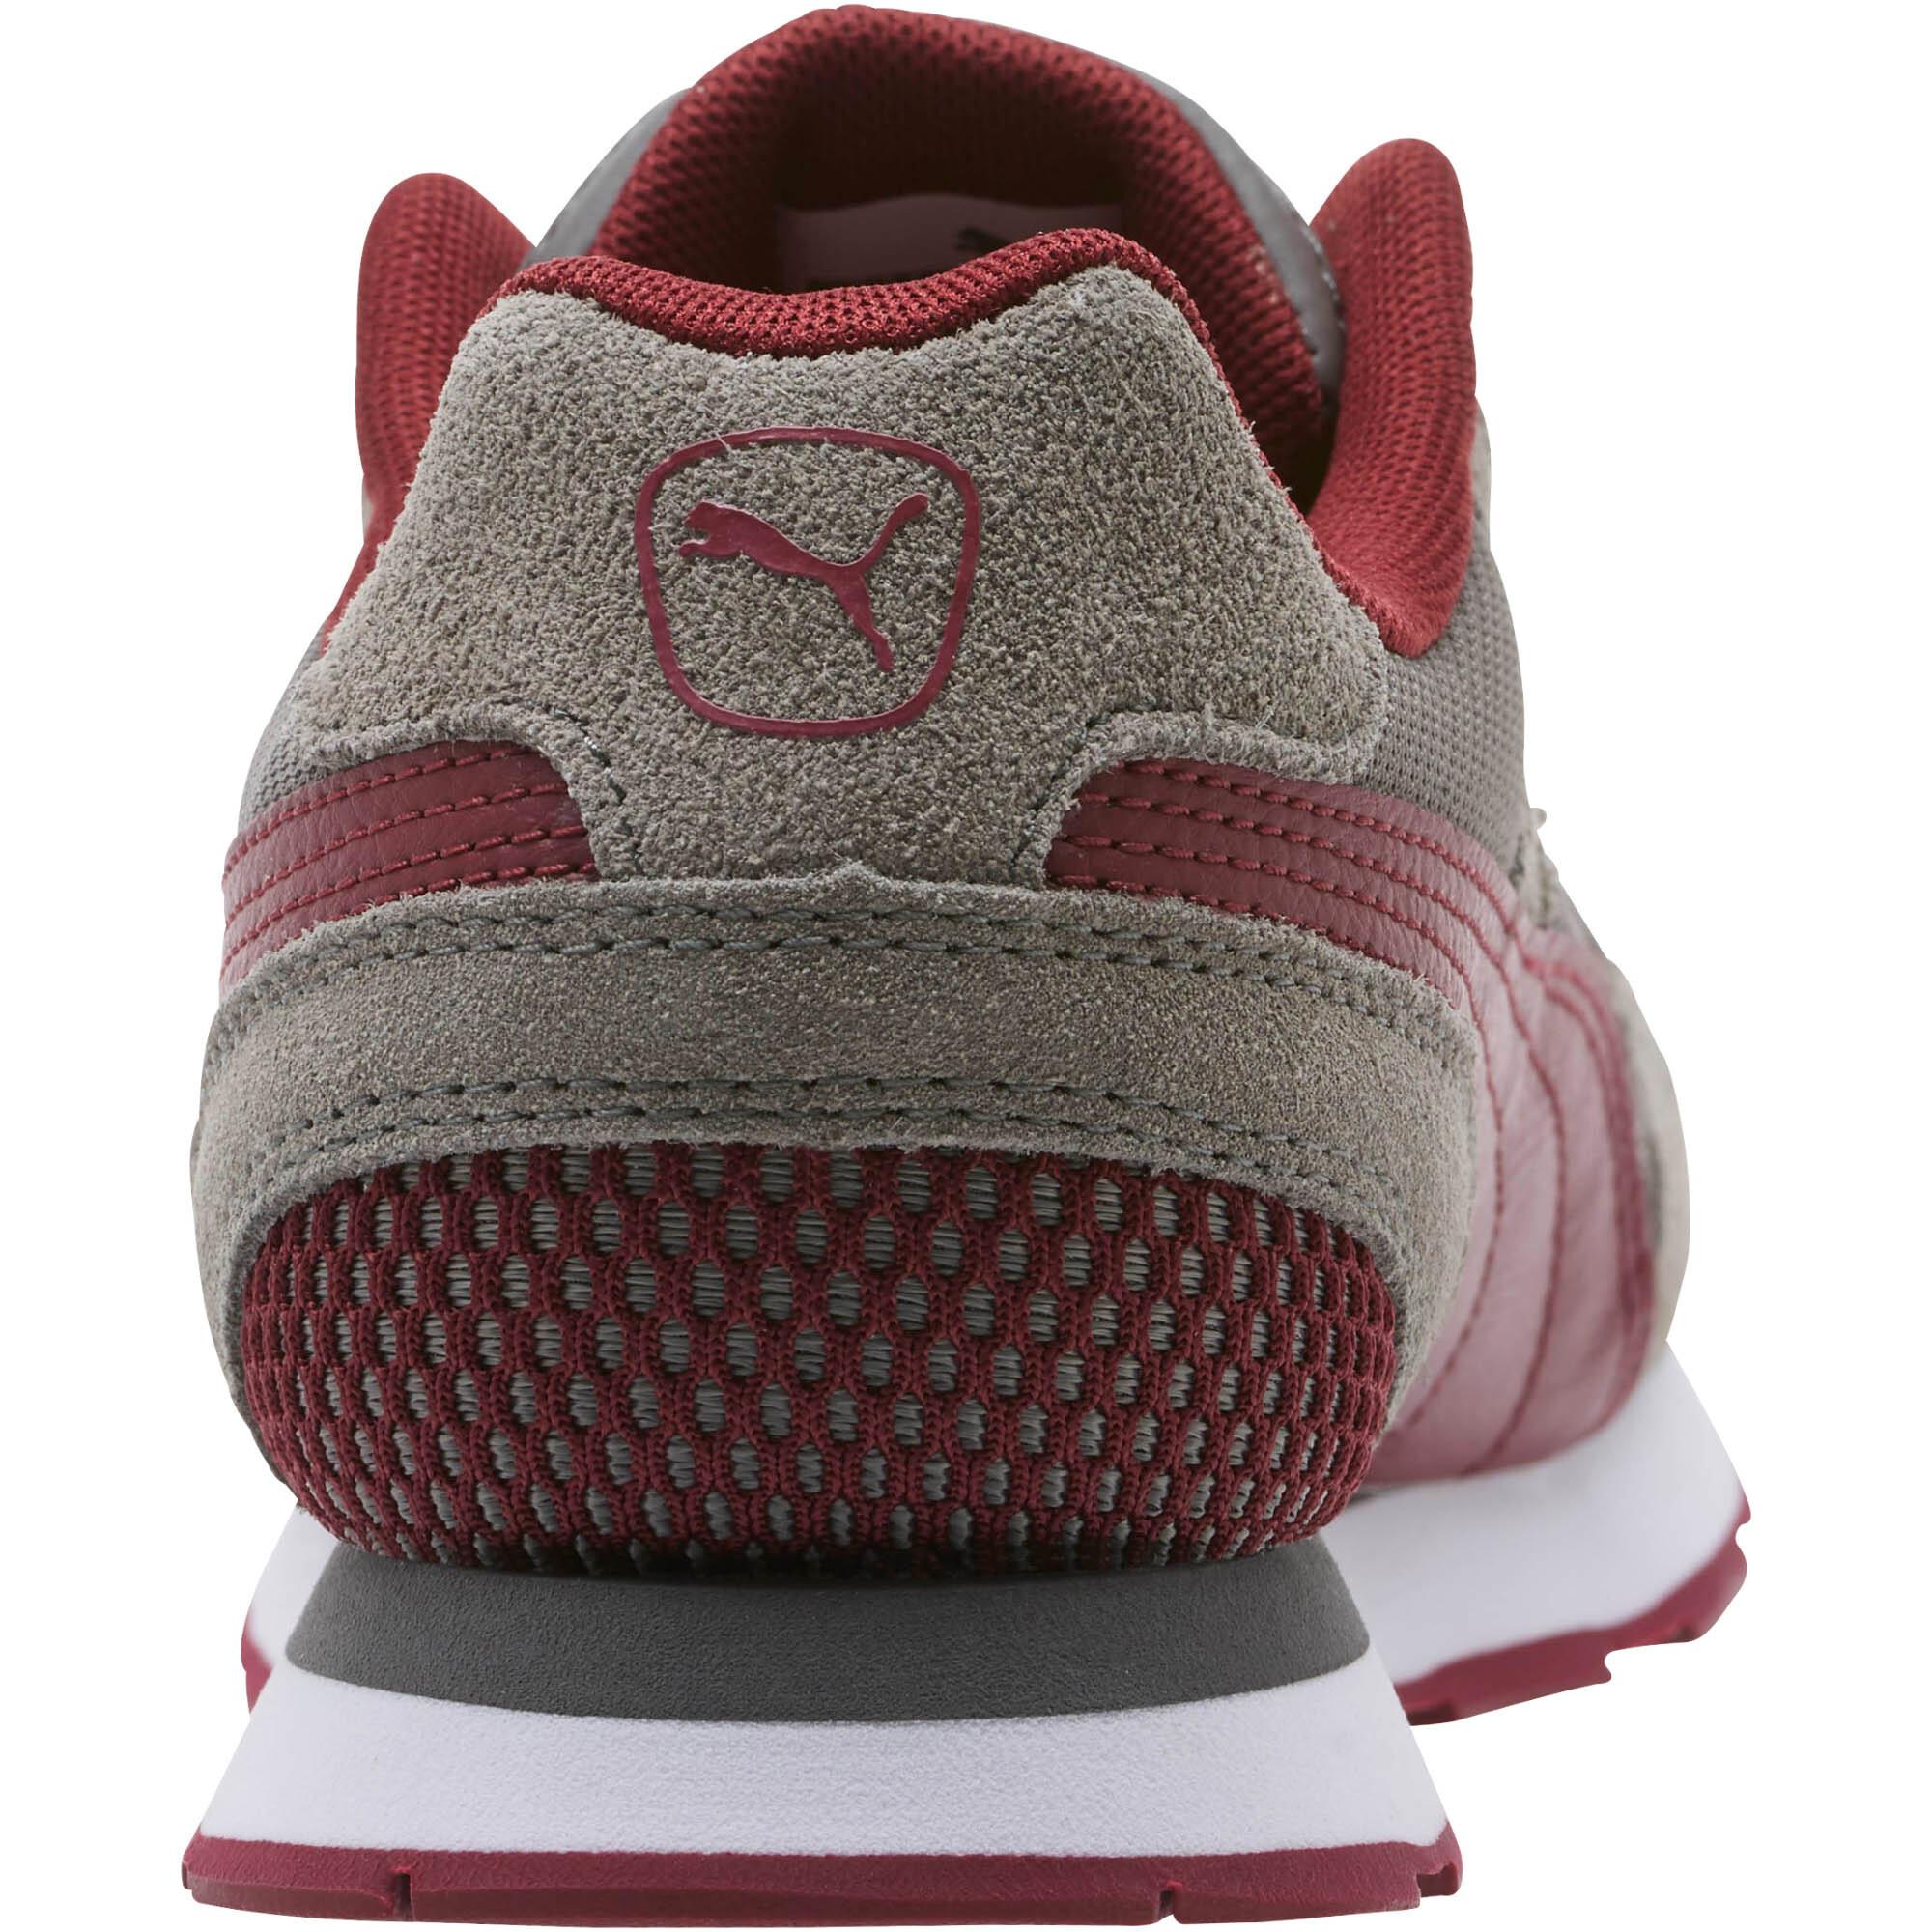 PUMA-Vista-Women-s-Sneakers-Women-Shoe-Basics thumbnail 19